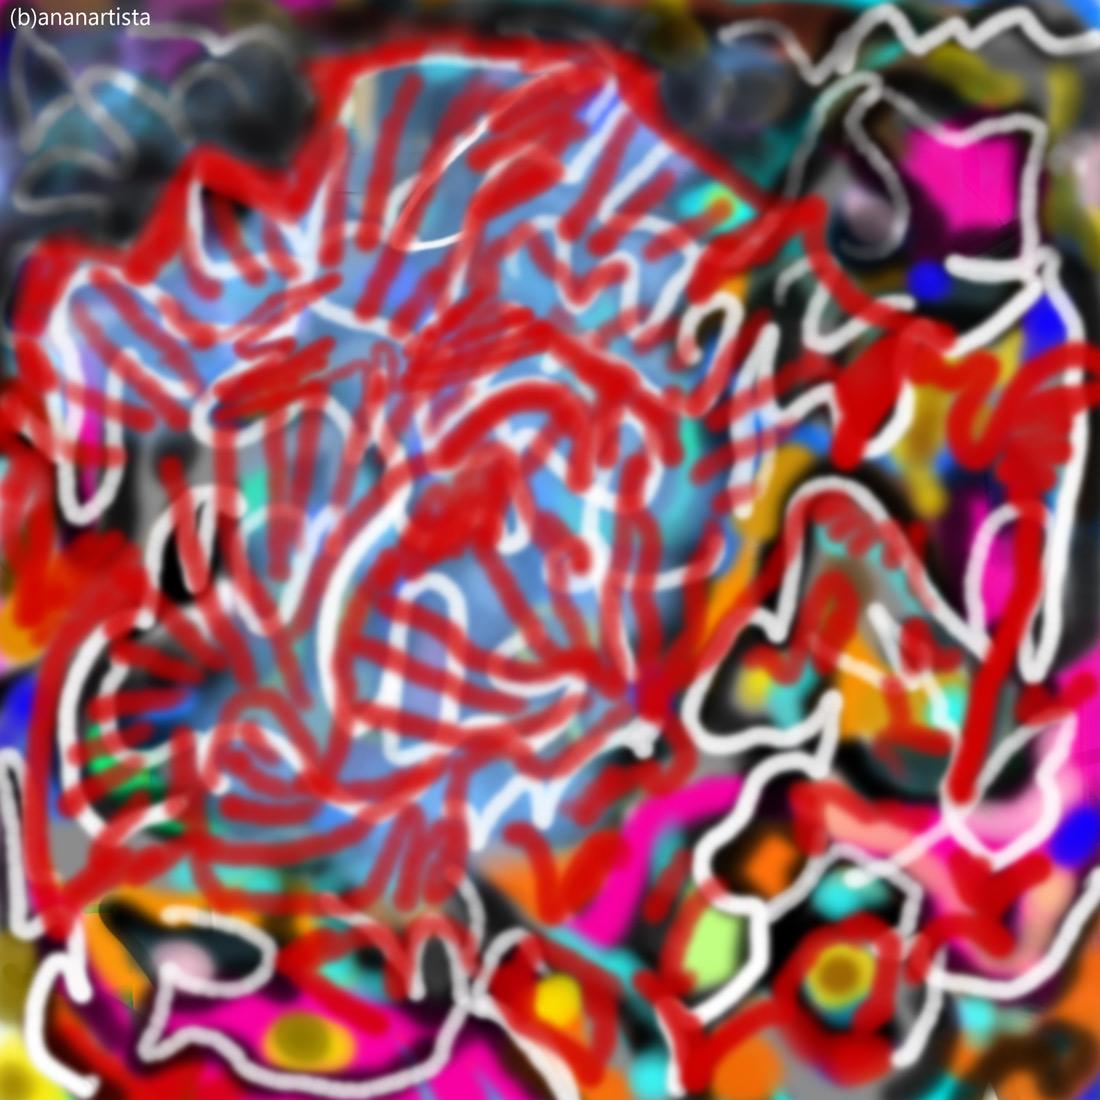 coral reef: digital painting art by (b)ananartista sbuff